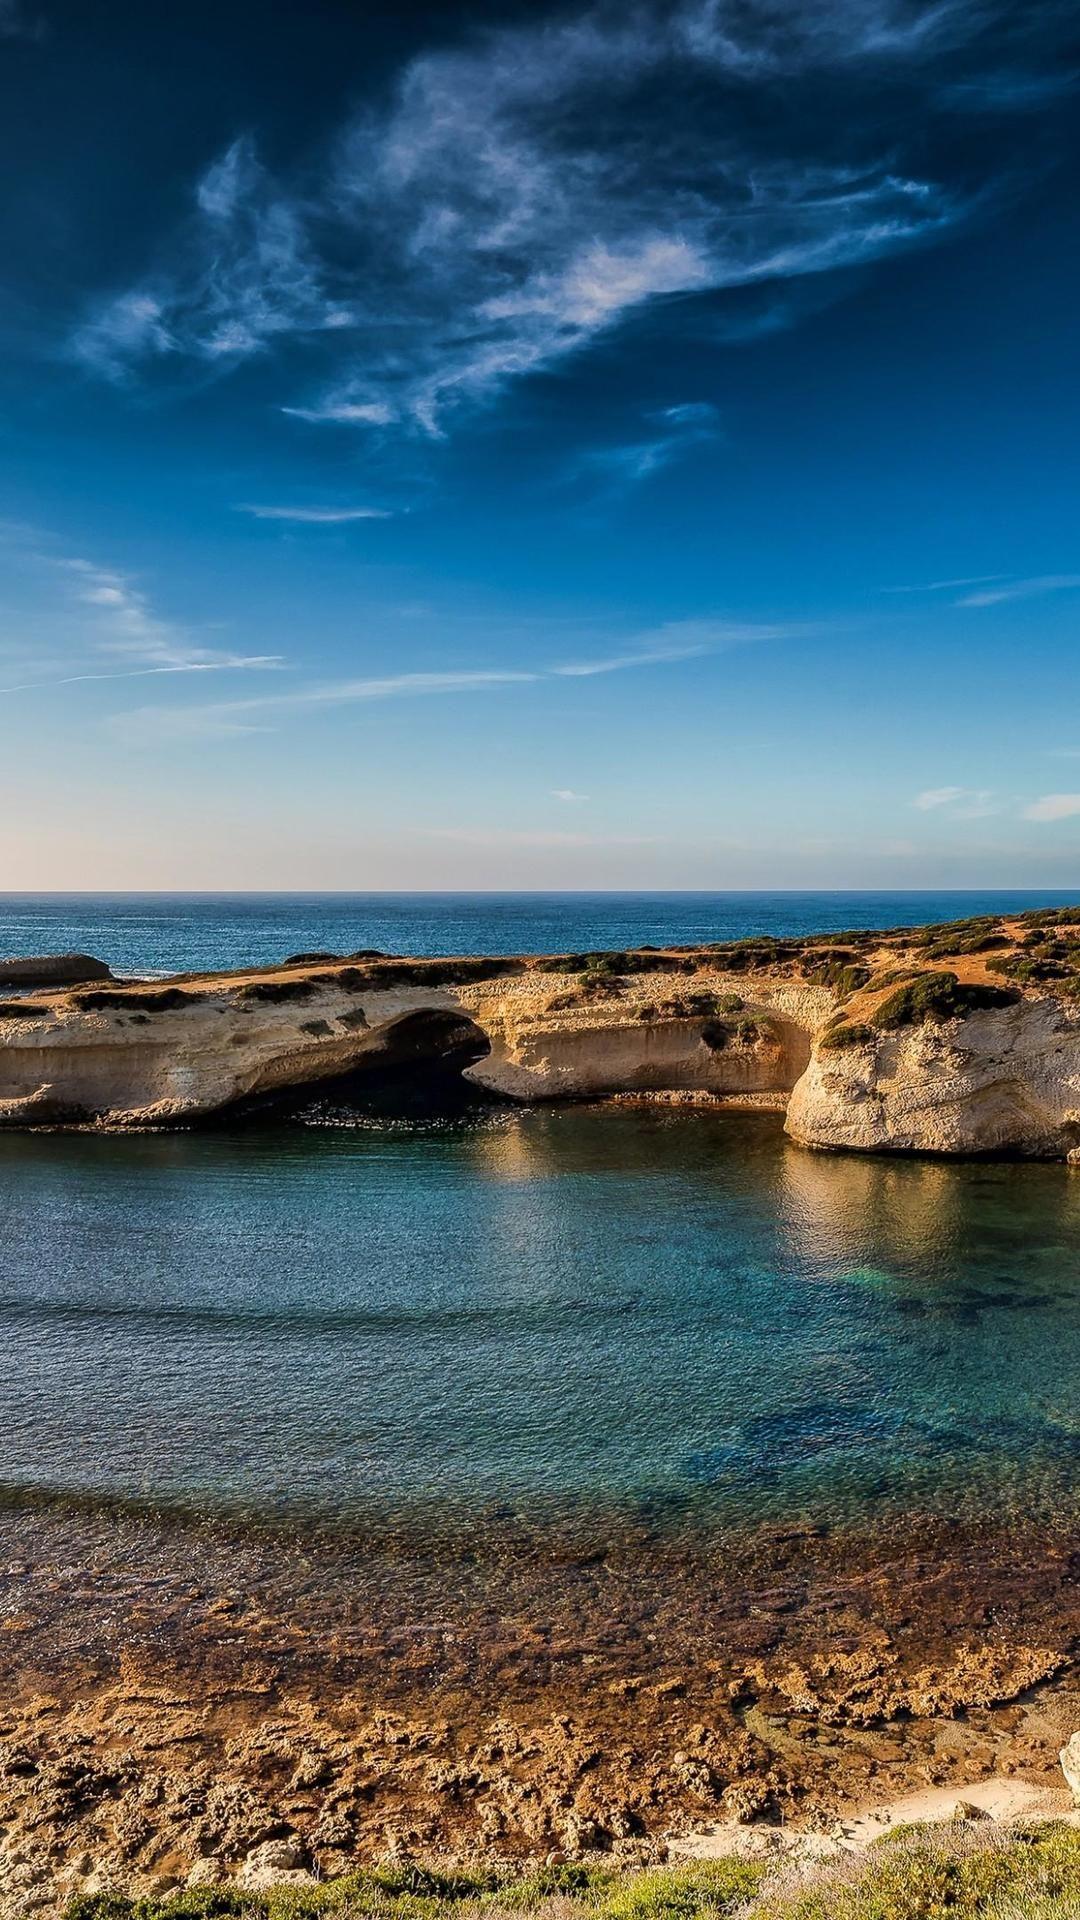 Body of water, Sky, Sea, Nature, Blue, Water Ocean